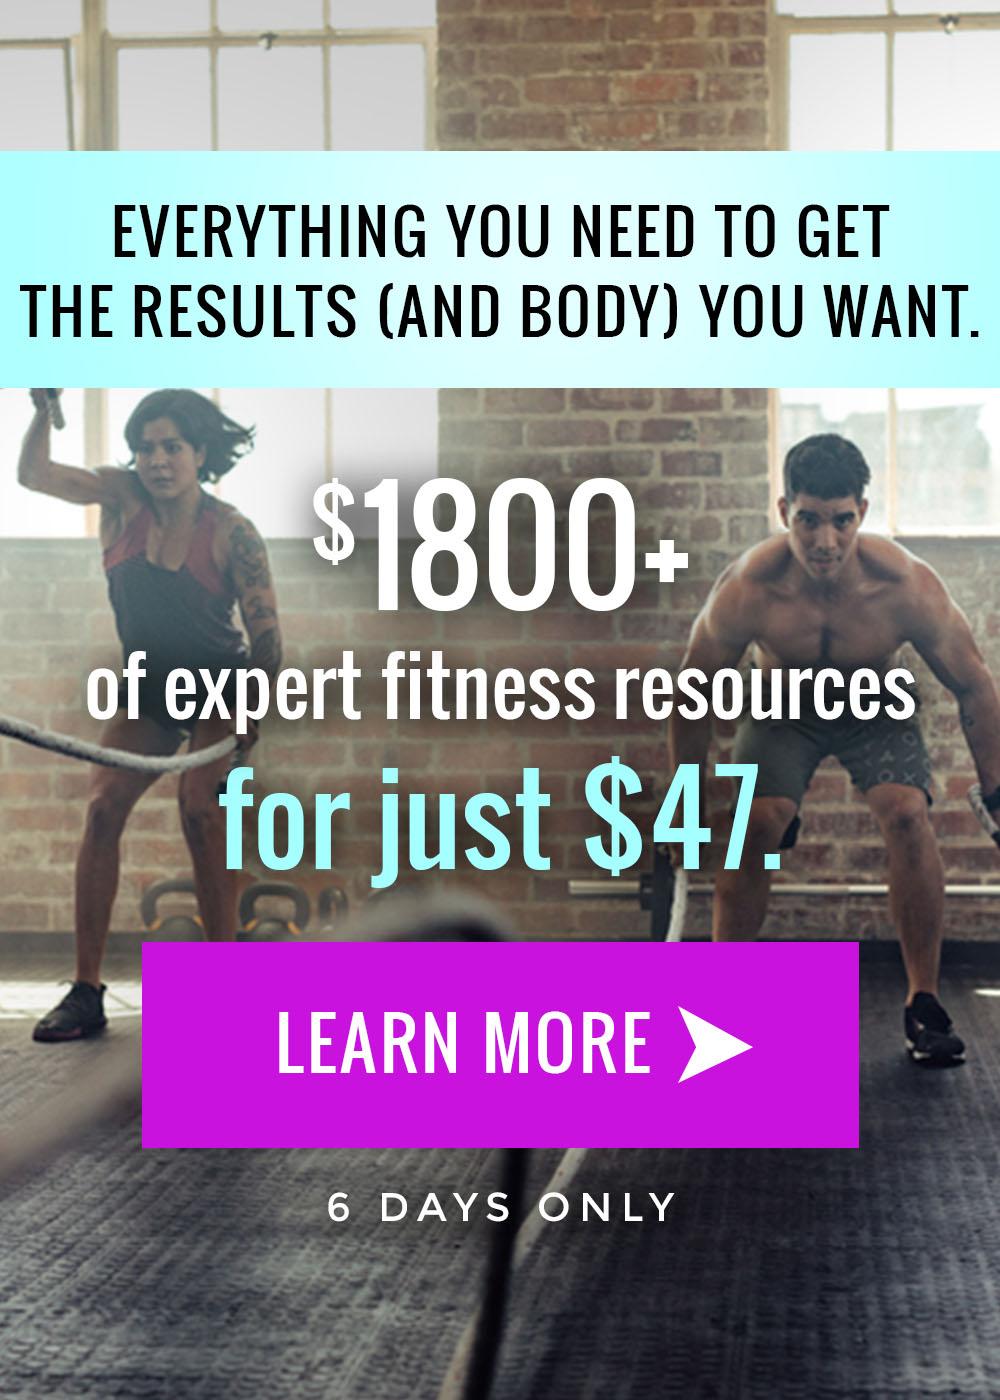 Ist Fitness Singles frei